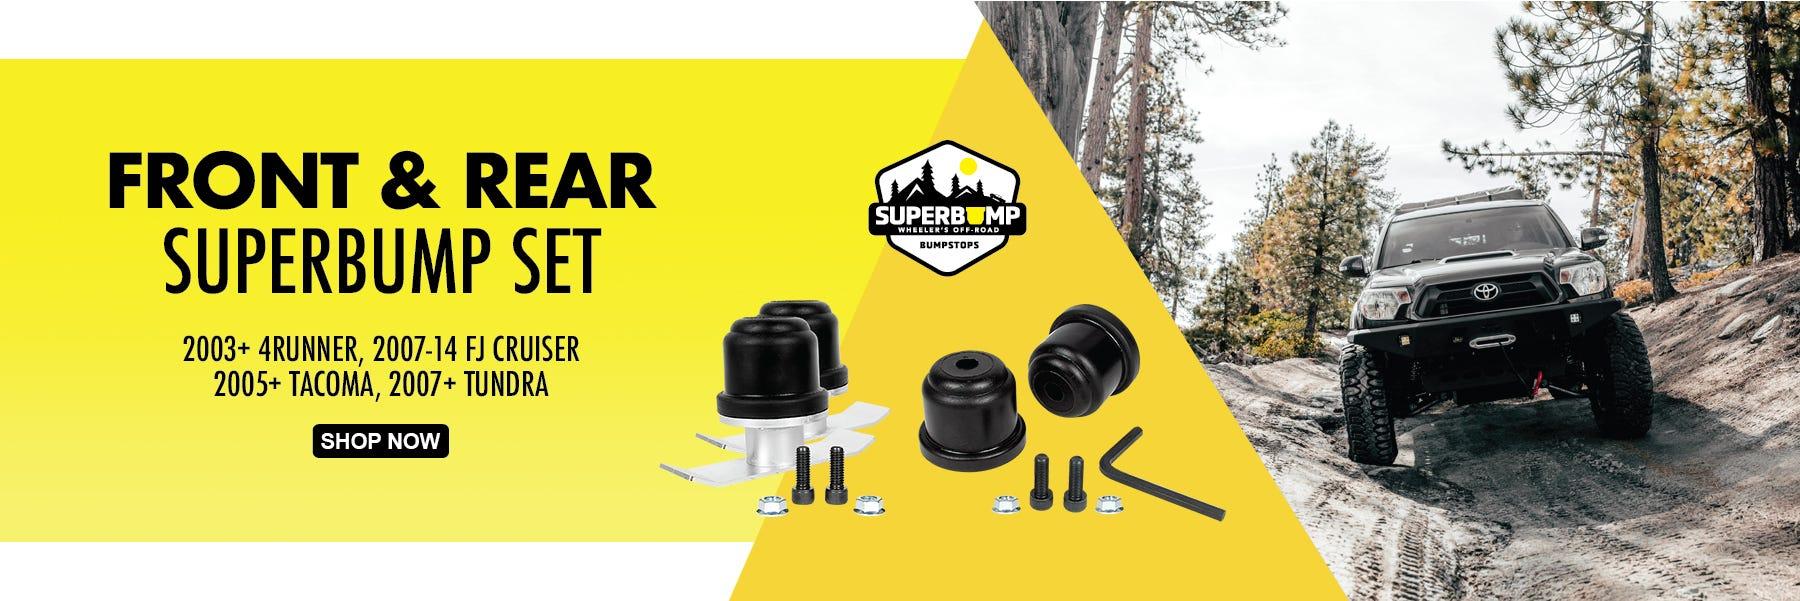 Wheeler's Off-Road SuperBump Front & Rear Bumpstop Kits